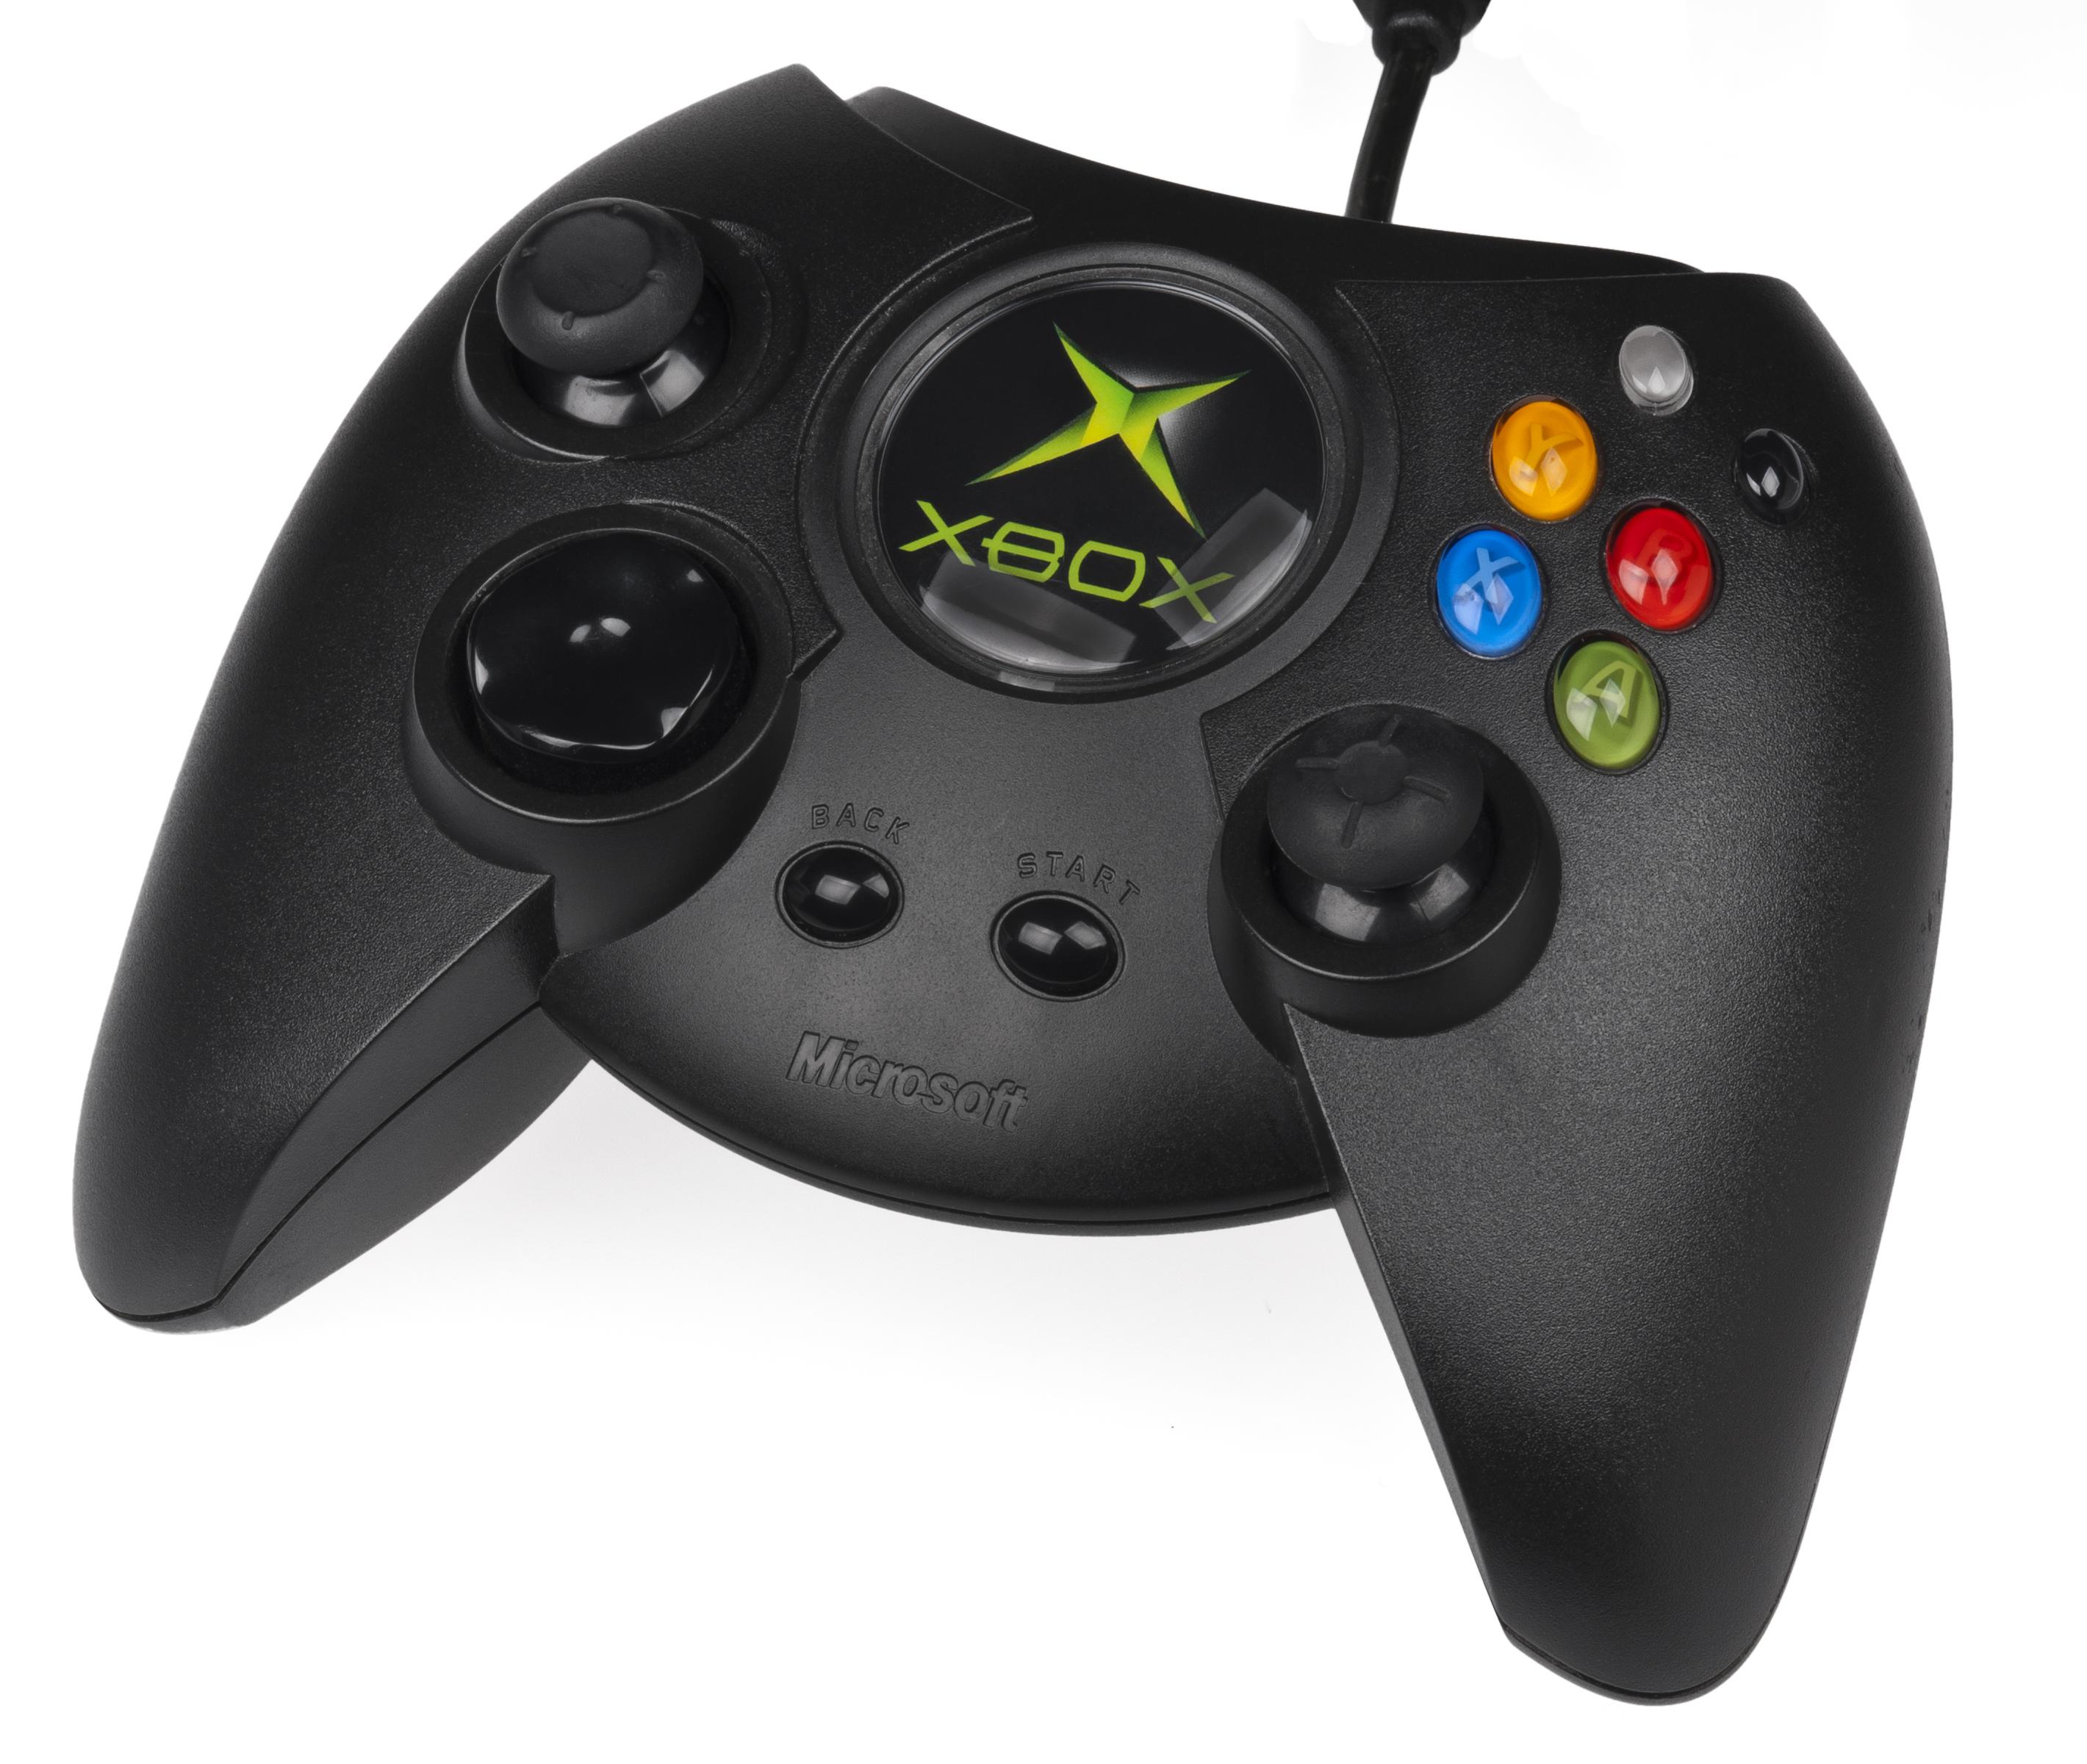 https://i1.wp.com/upload.wikimedia.org/wikipedia/commons/c/c5/Xbox-Duke-Controller.jpg